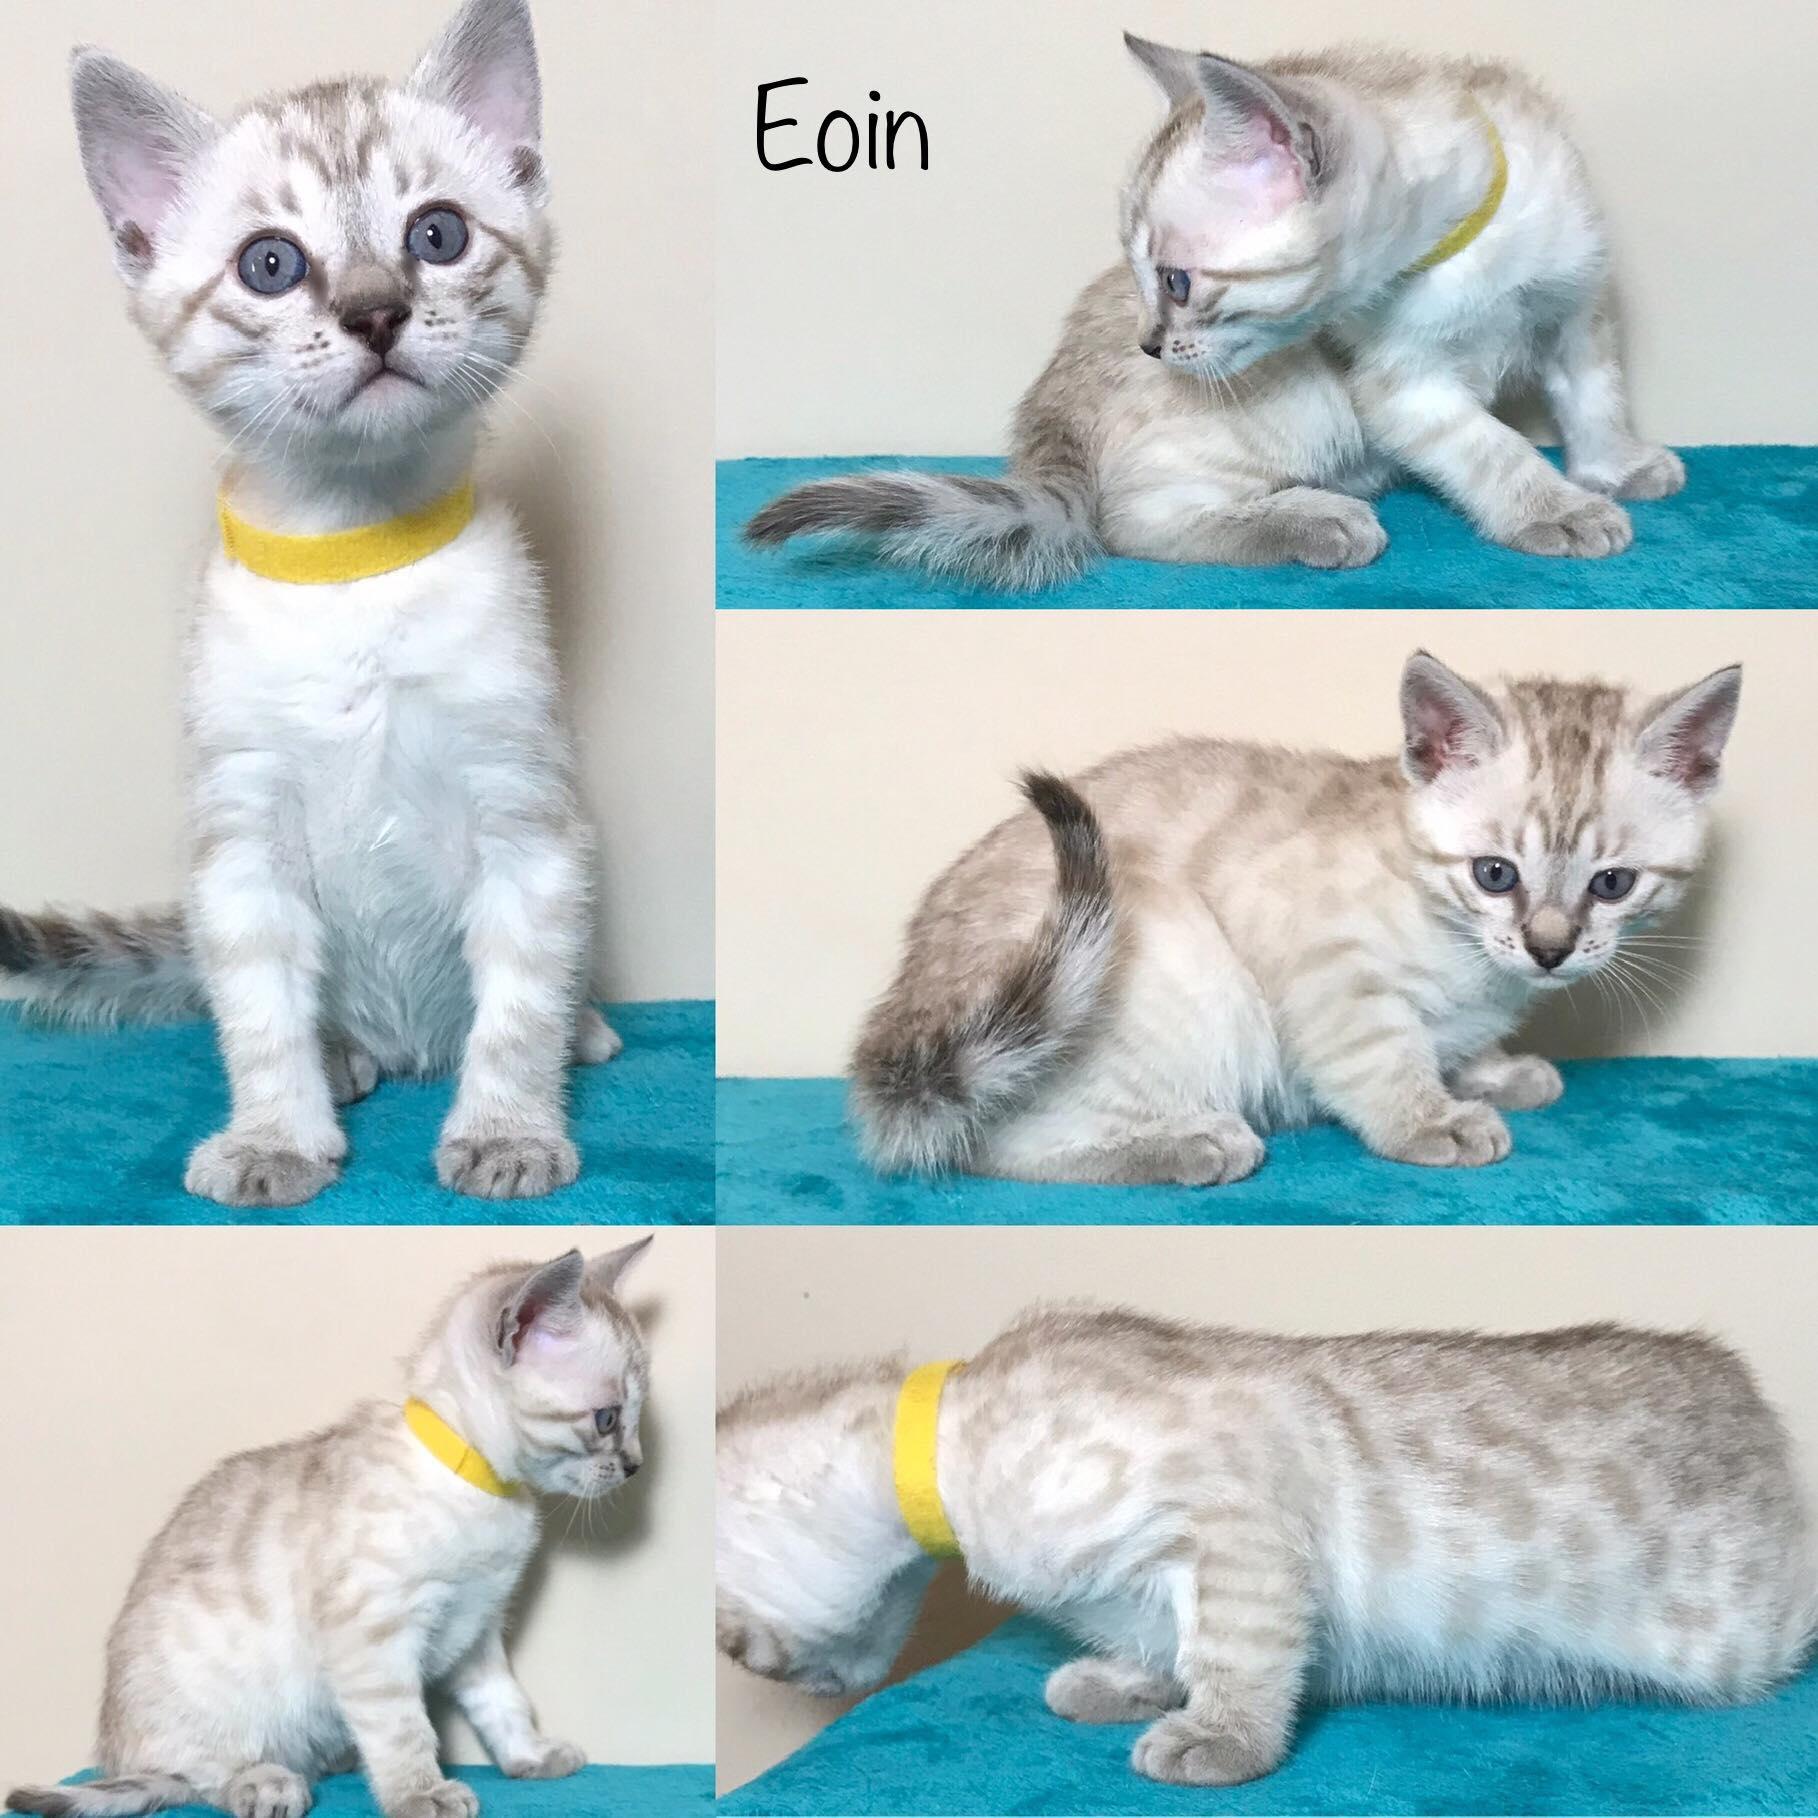 Eoin 6 weeks